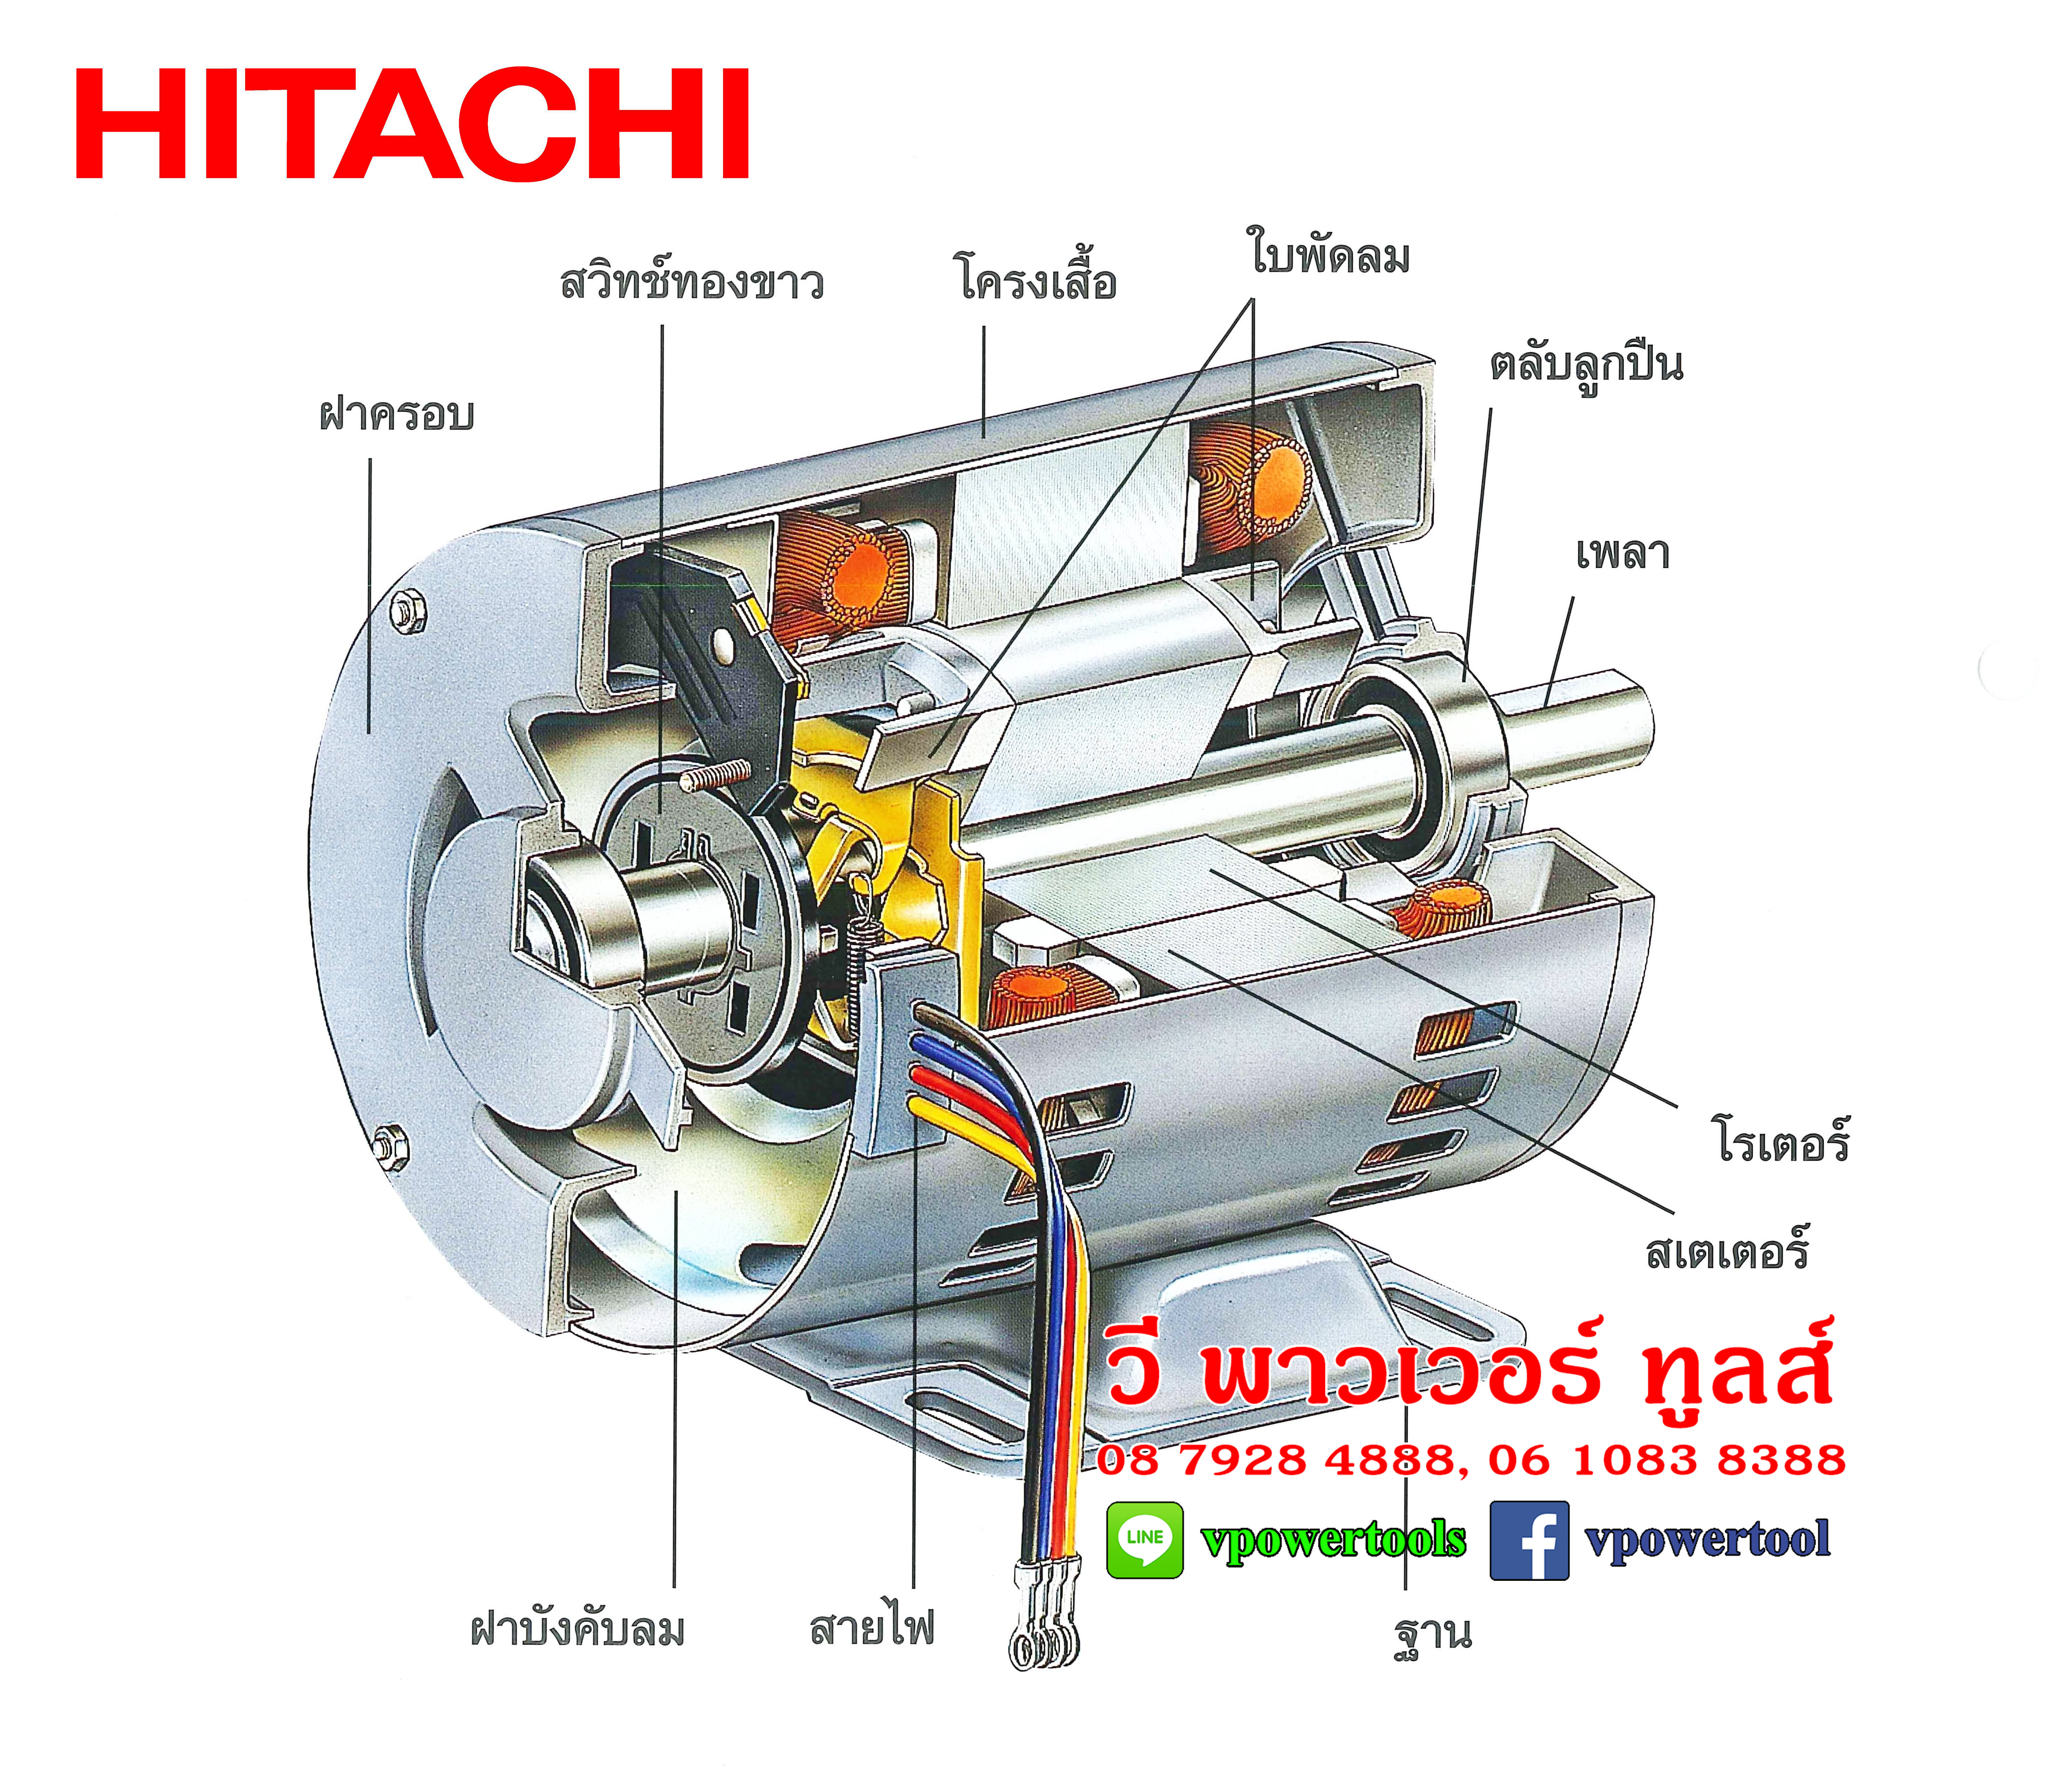 HITACHI มอเตอร์ไฟฟ้า ฮิตาชิ 1เฟส (220V.)